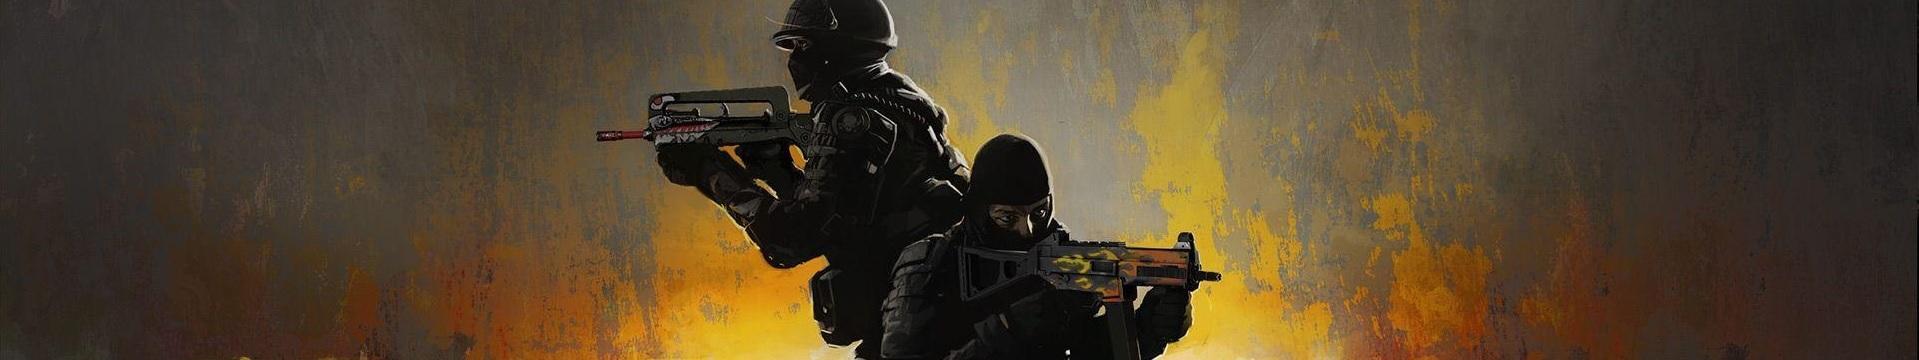 Counter Strike Go Server mieten Wallpaper